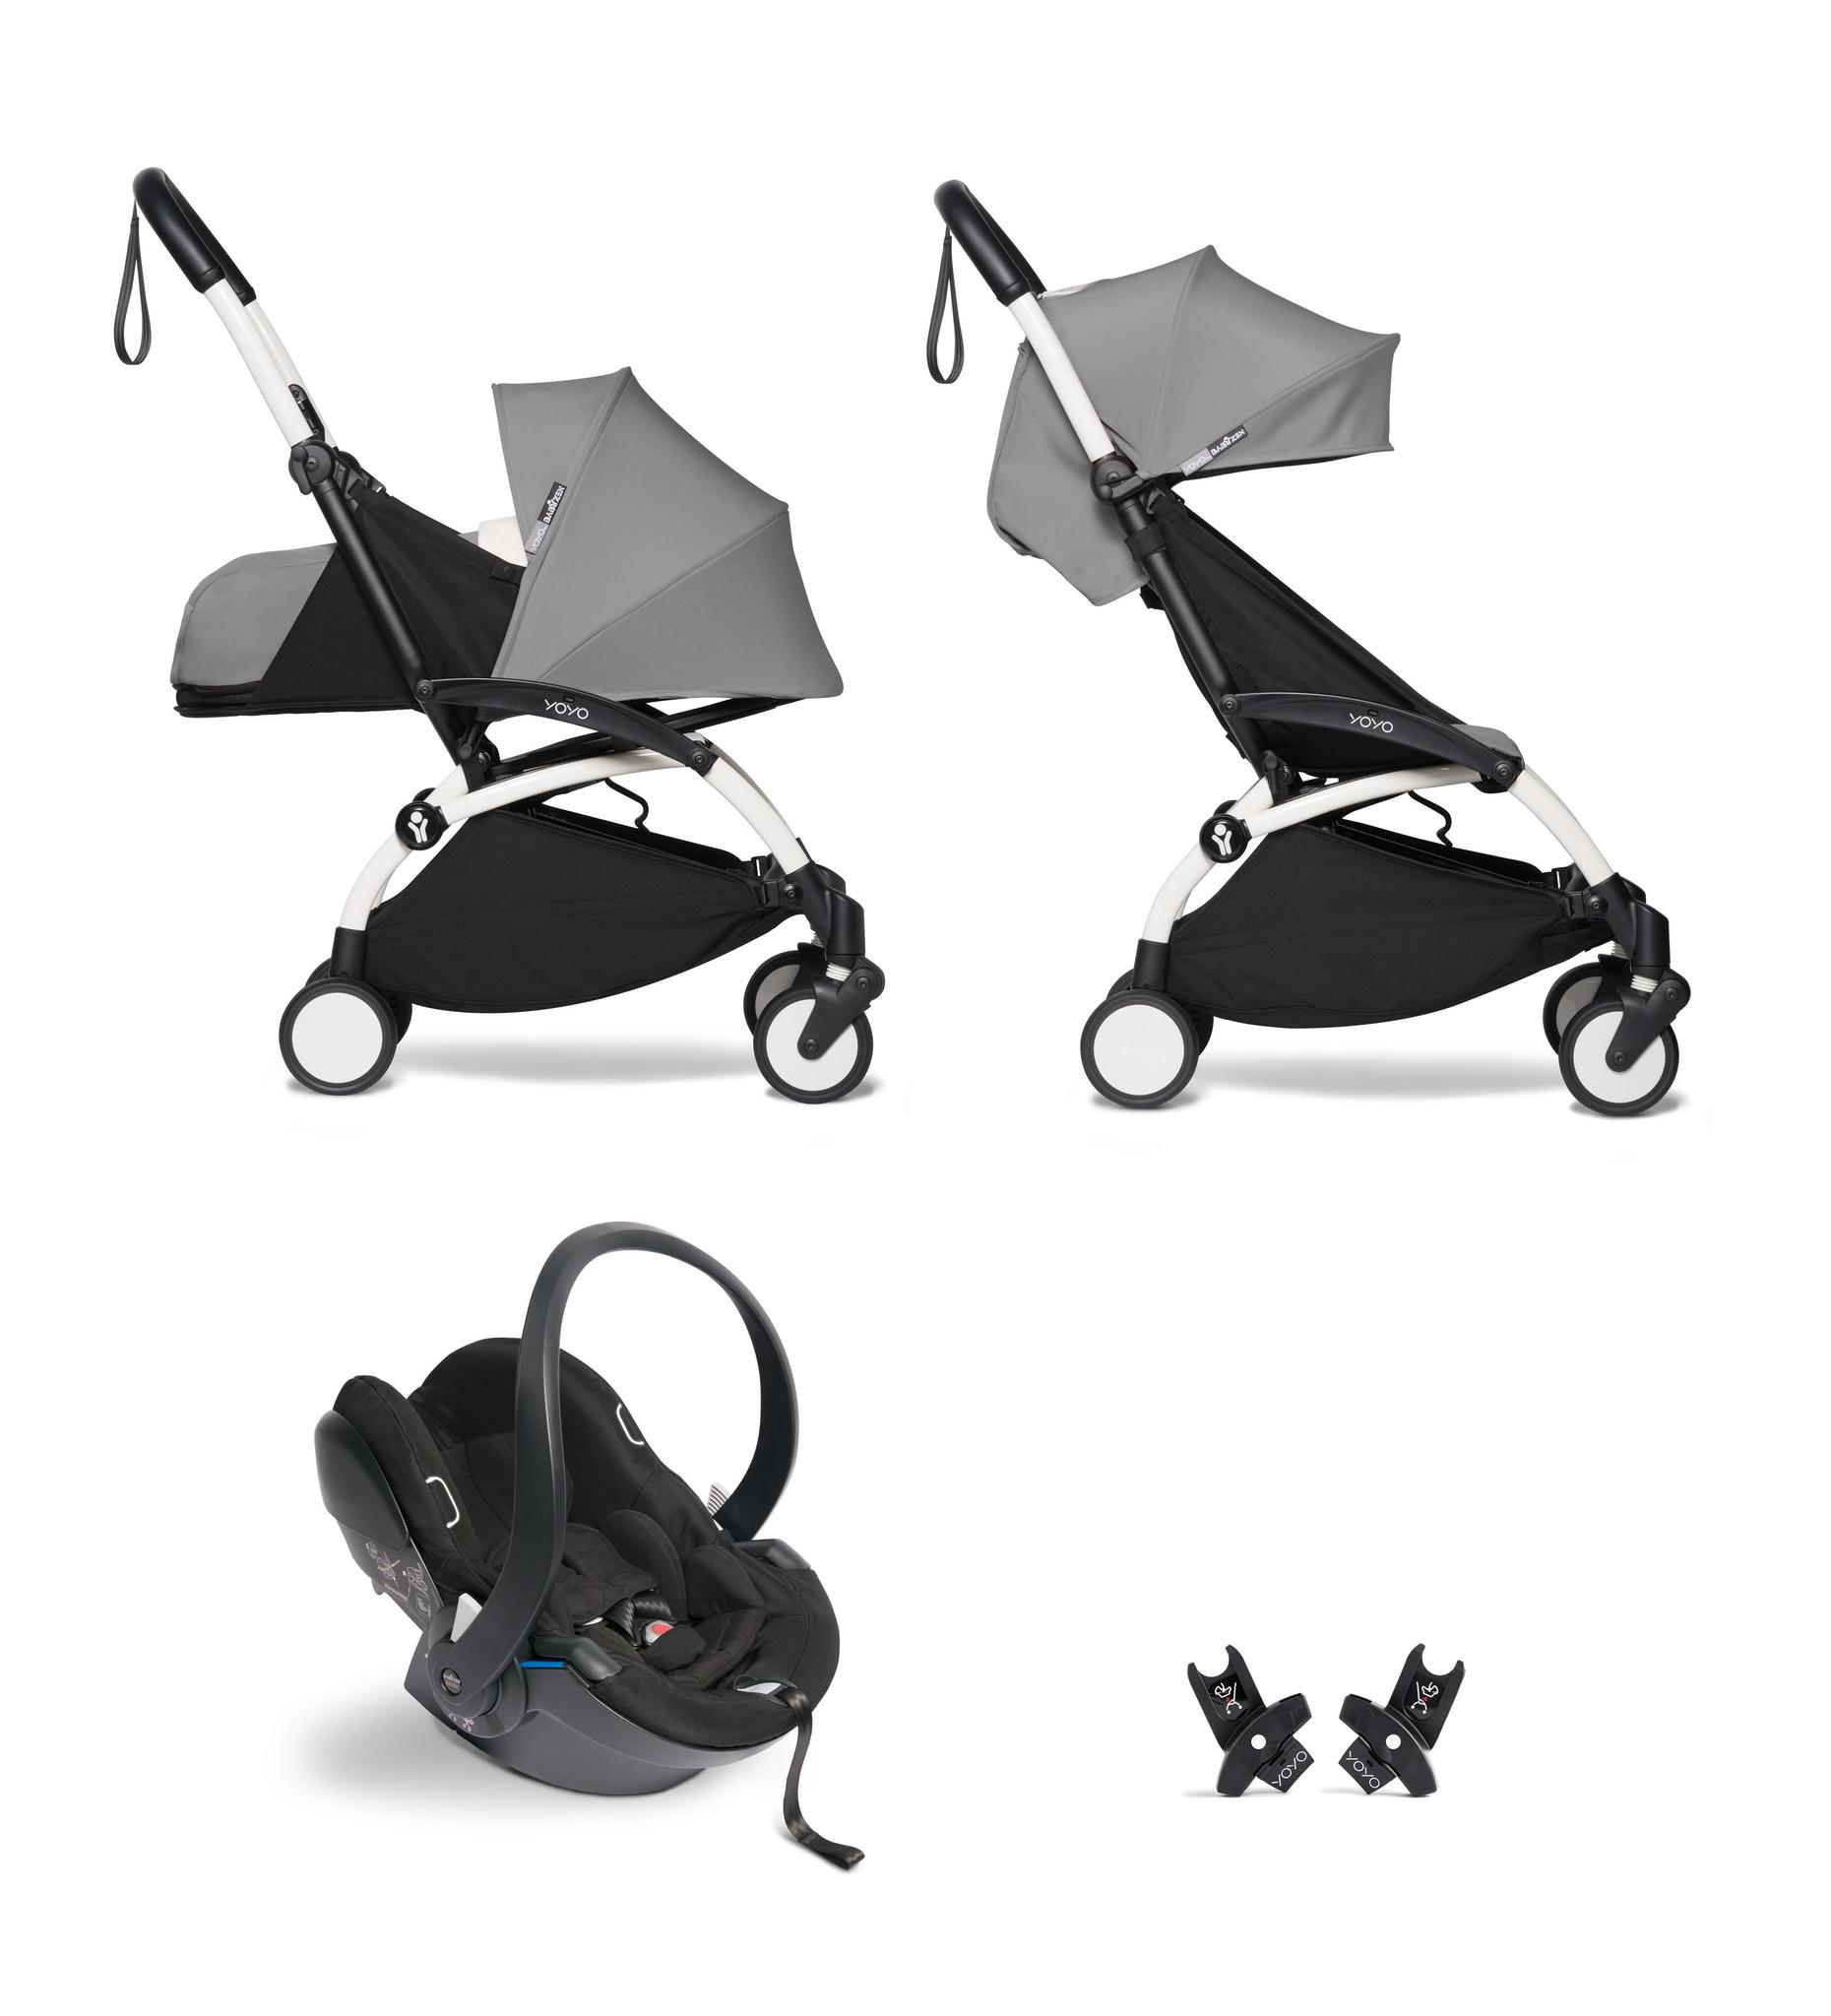 Babyzen YOYO² buggy COMPLEET / FULL SET 0+ and 6+ grijs frame wit incl. YOYO² BeSafe autostoel zwart